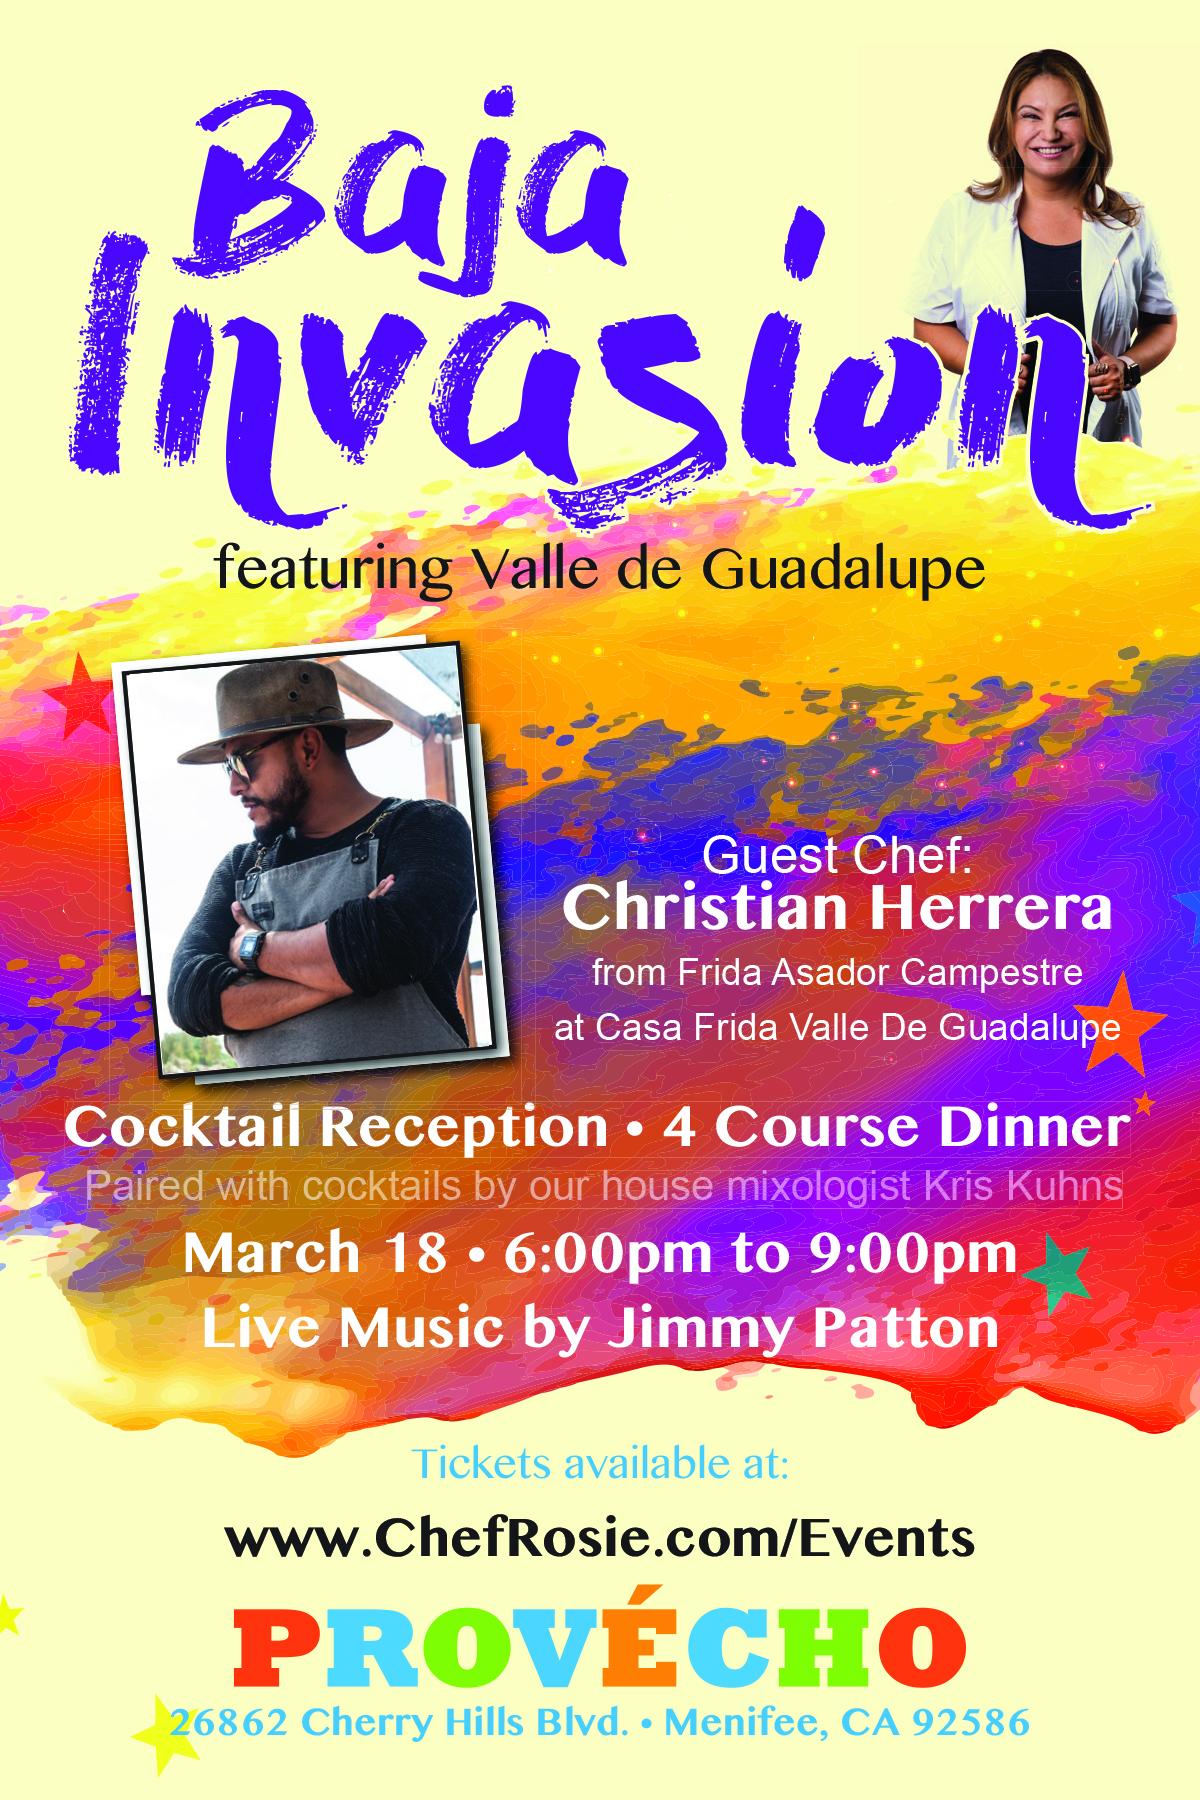 Baja Invasion dinner with Chef Rosie, Chef Christian Herrera